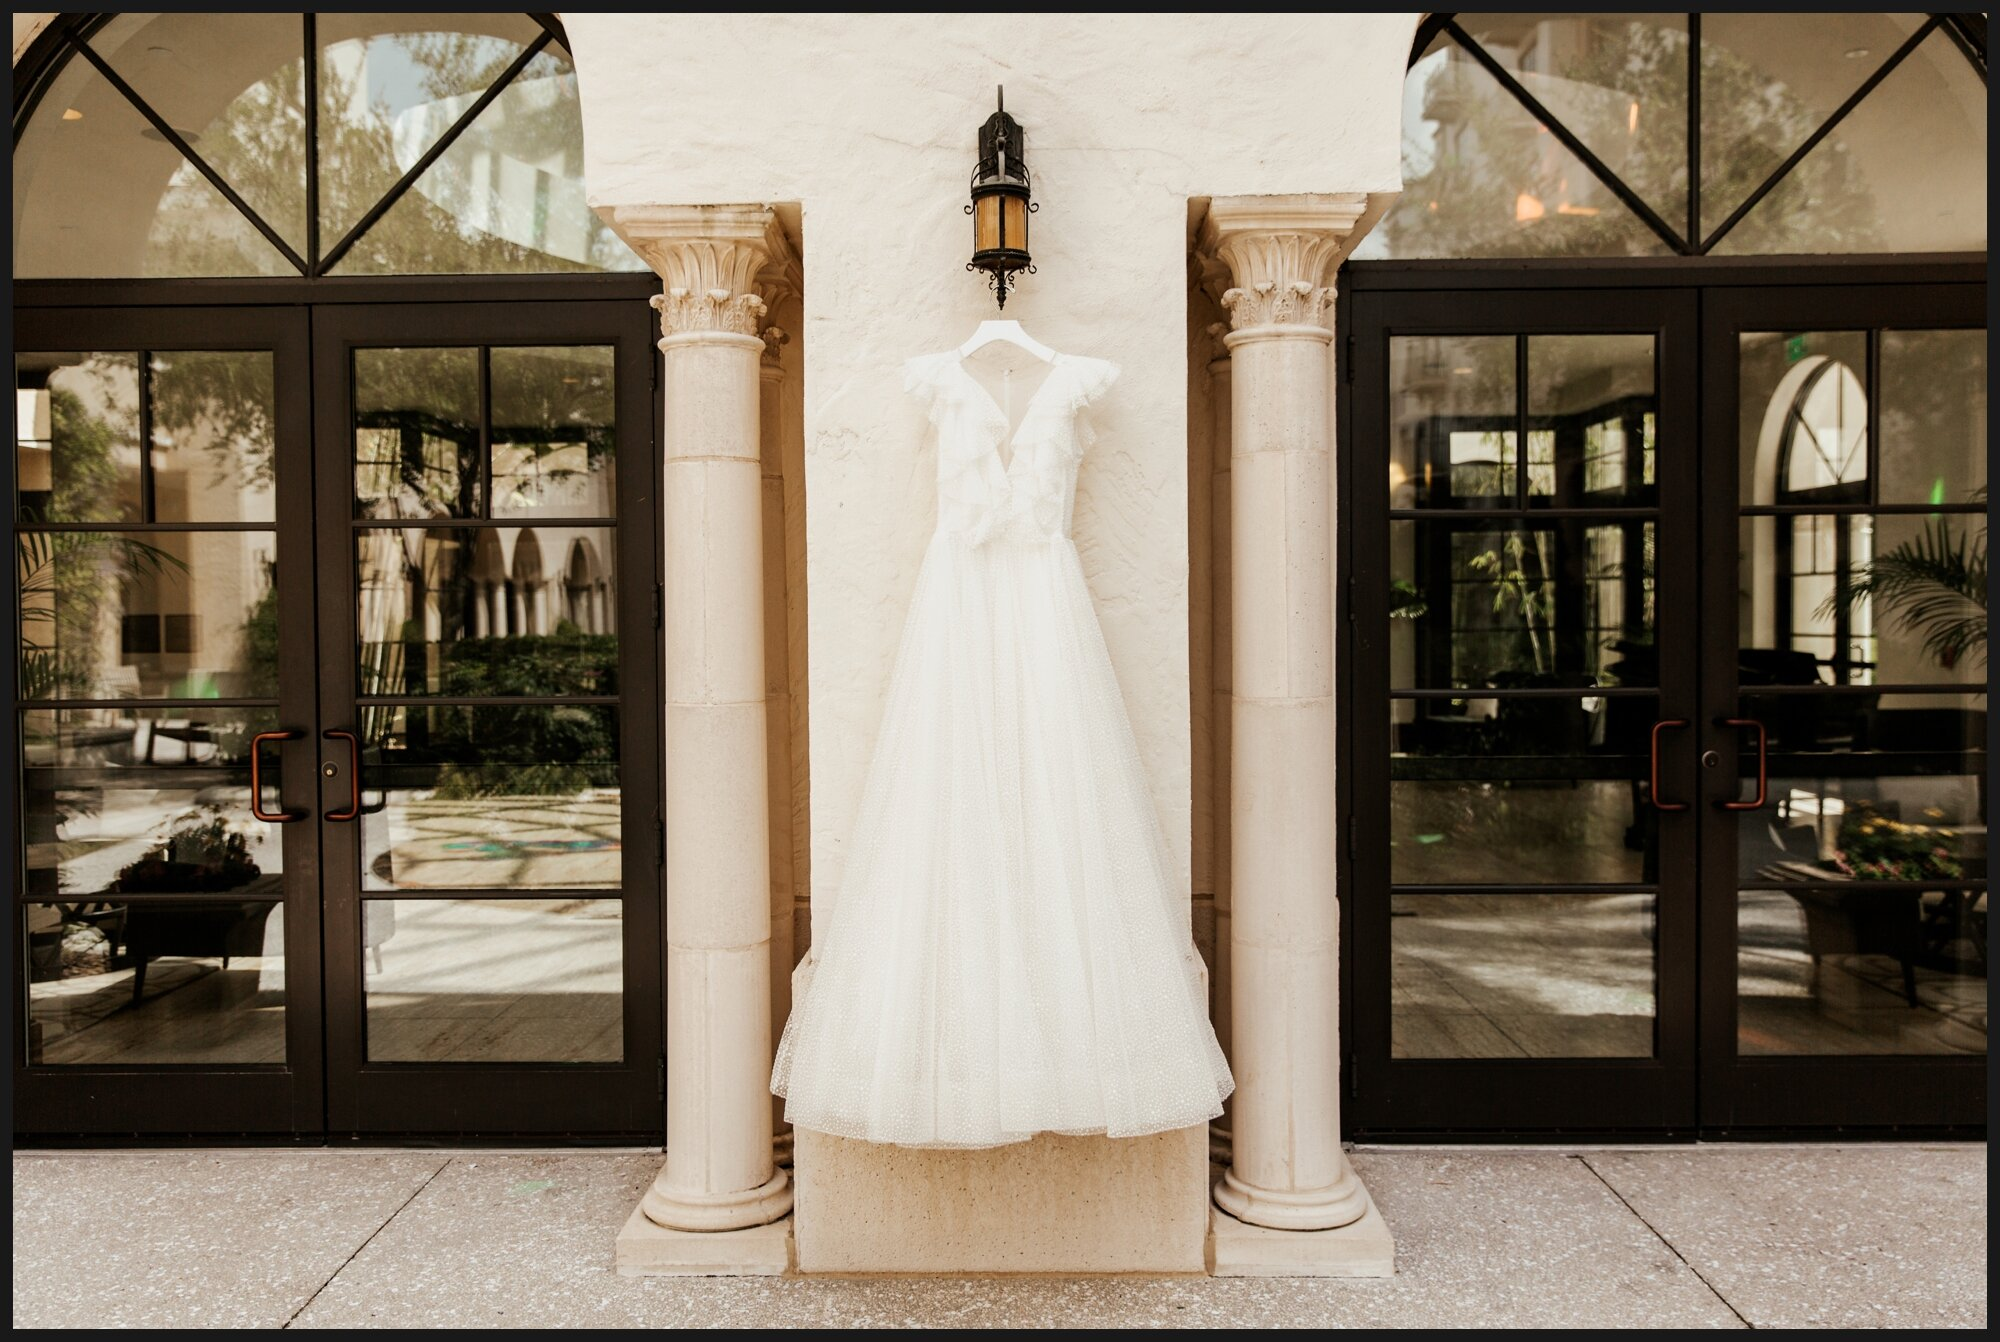 Orlando-Wedding-Photographer-destination-wedding-photographer-florida-wedding-photographer-hawaii-wedding-photographer_0721.jpg